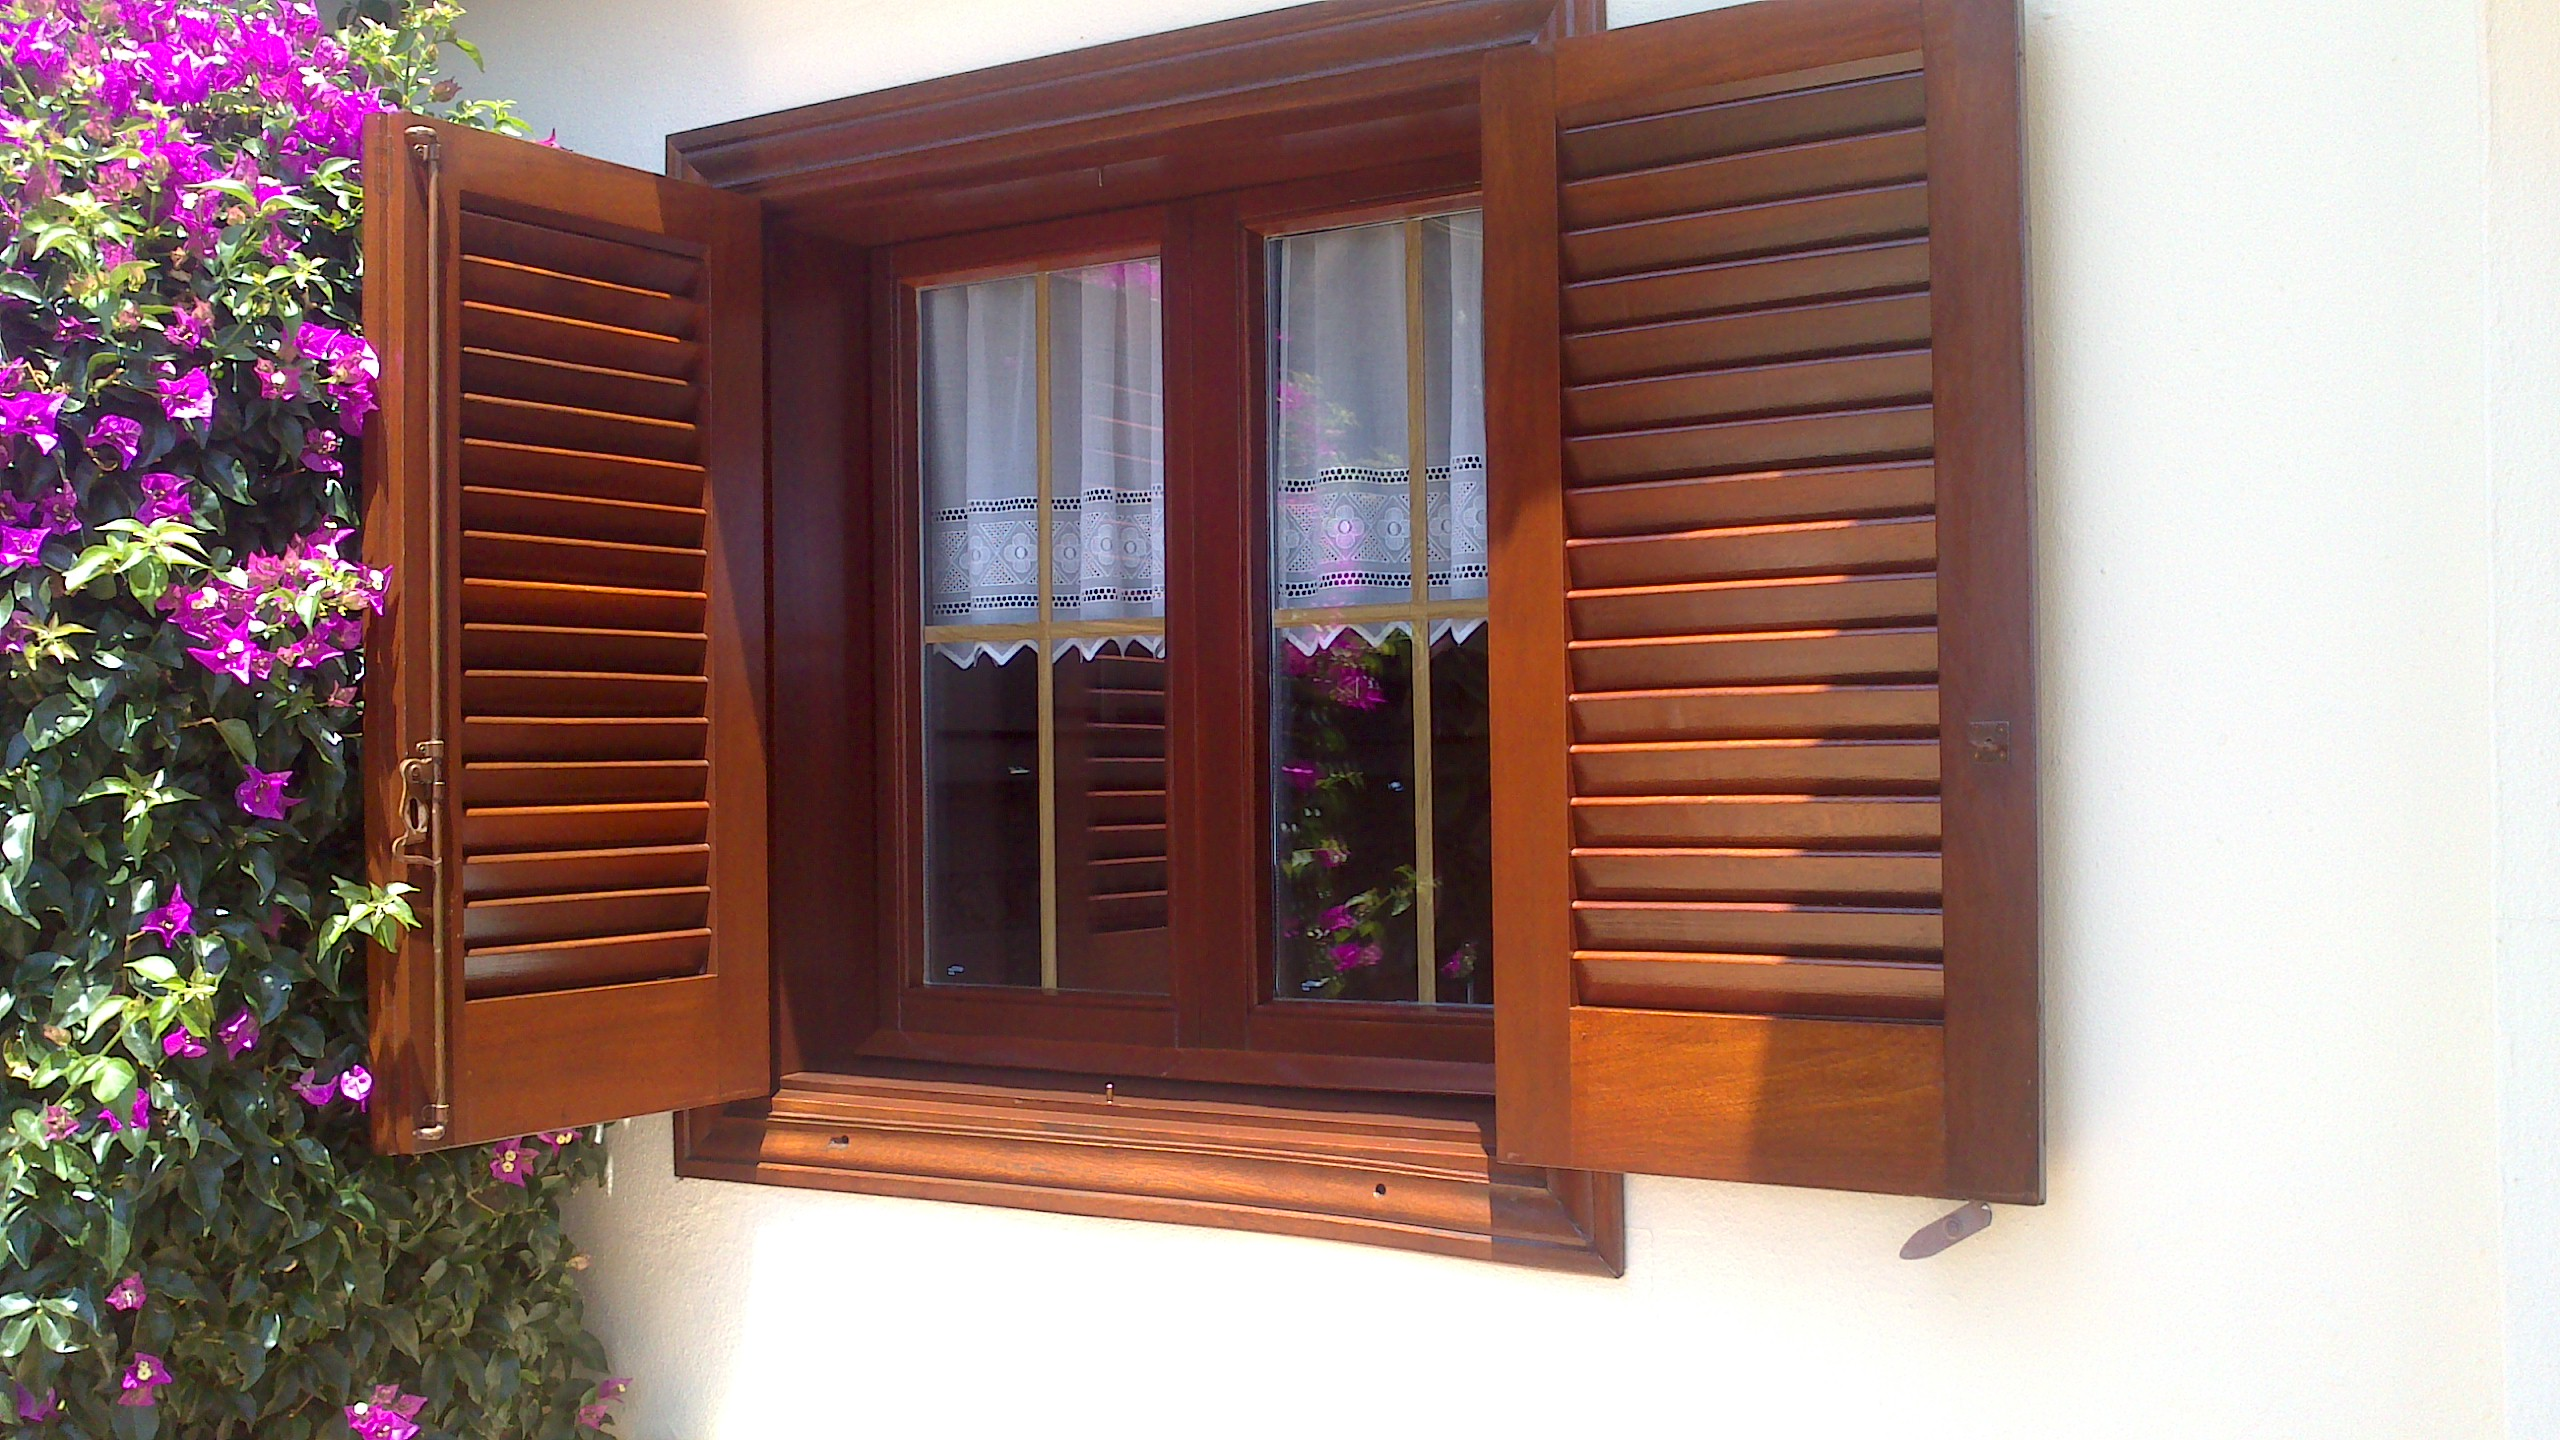 Restauracion carpinteria exterior teka puerta cochera y for Carpinteria de puertas de madera